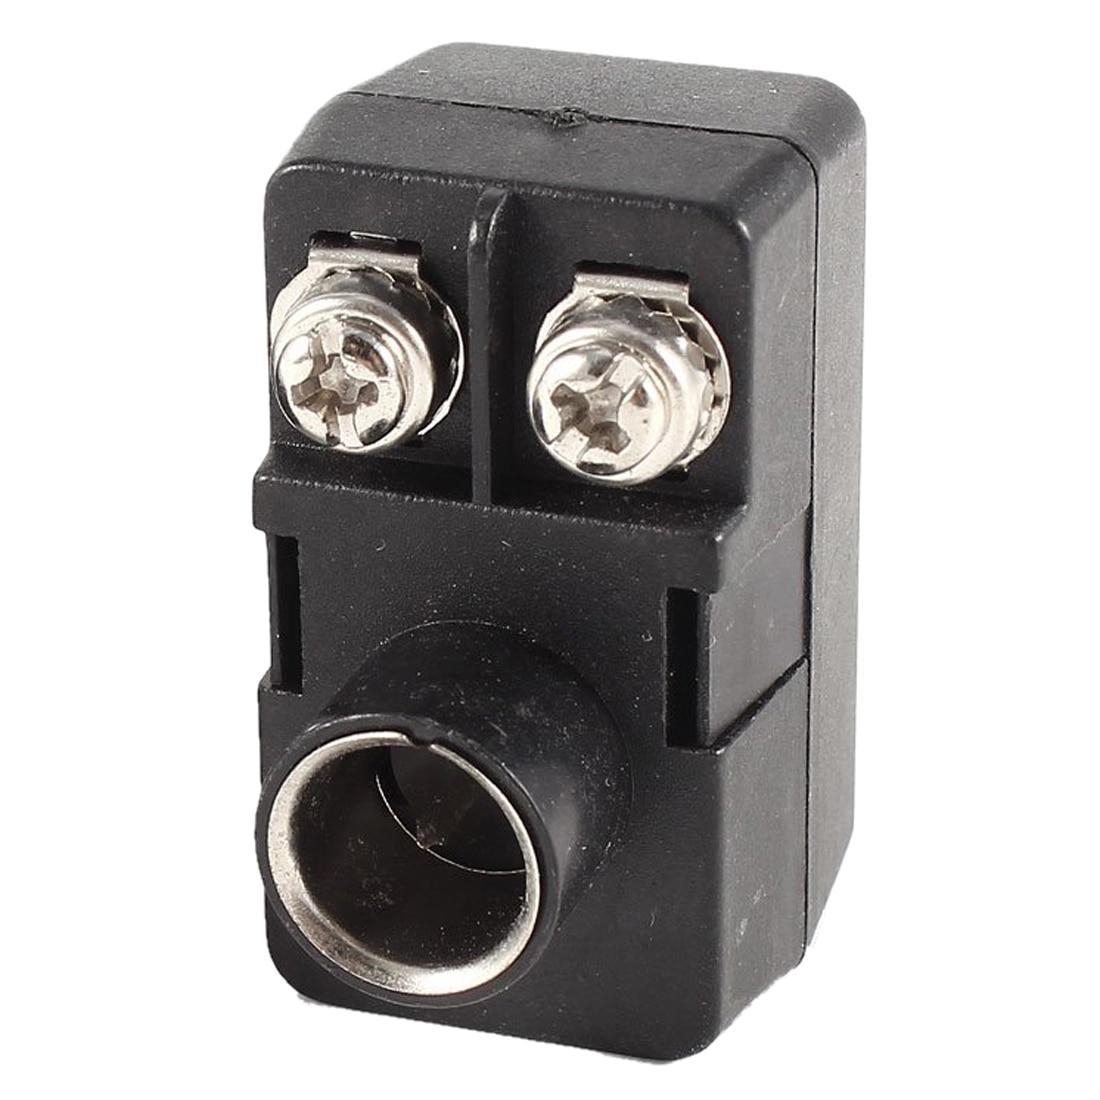 JABS  2 X Push-On Antenna Matching Transformer 300/75 Ohm TV F Coax Adapter